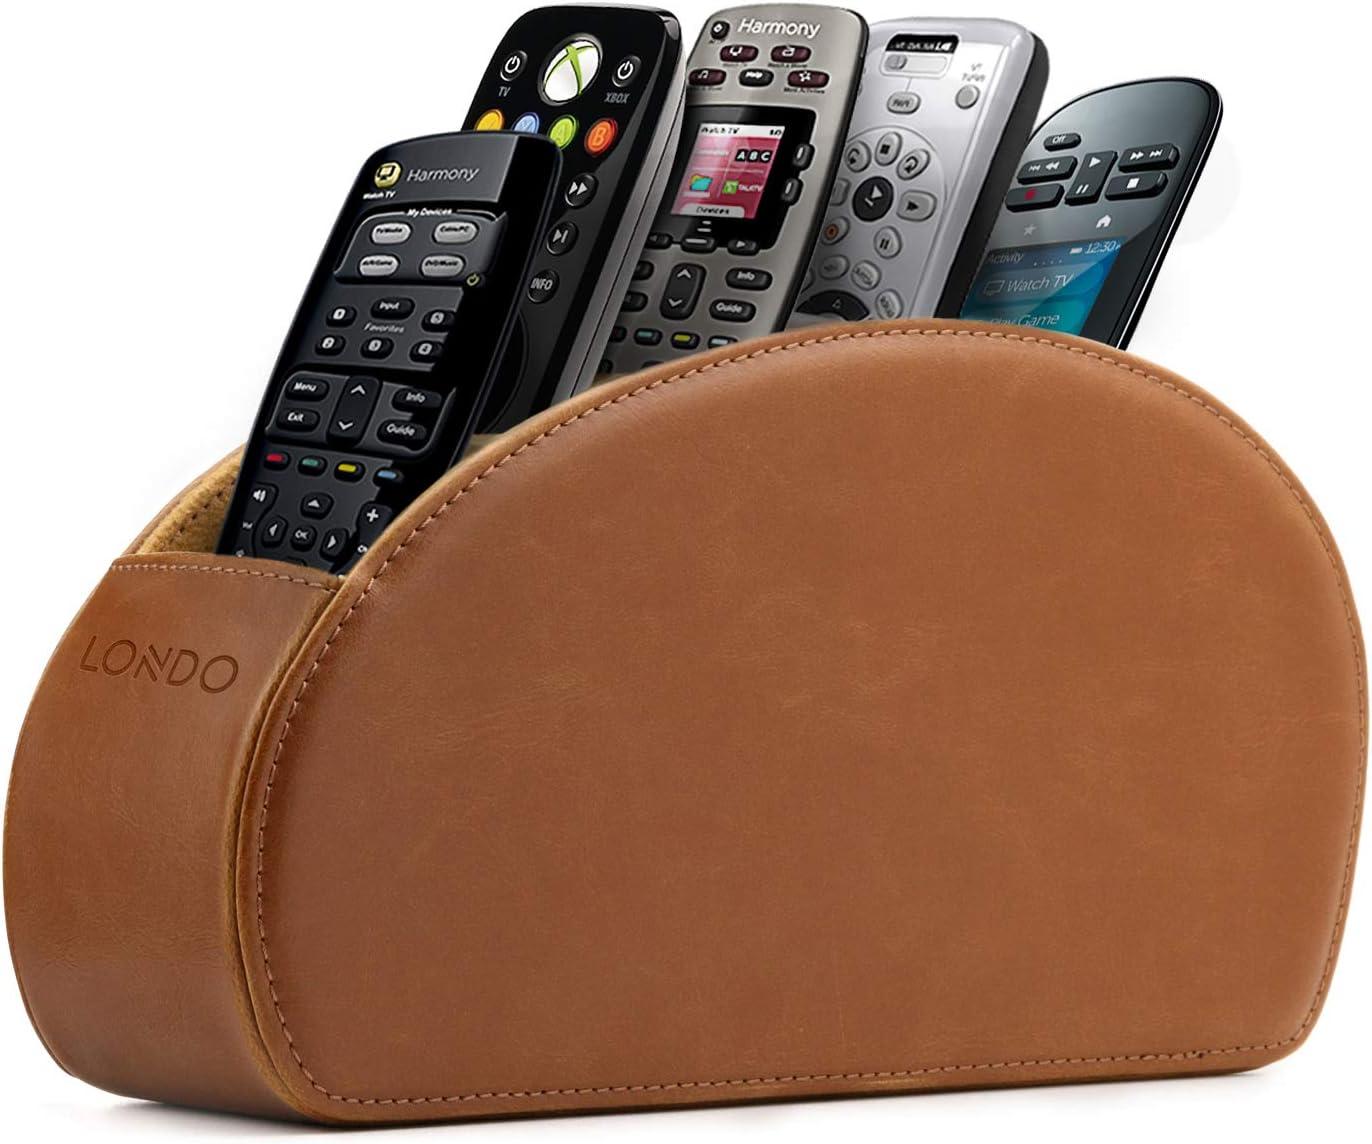 Londo – Soporte para Mando a Distancia con 5 Bolsillos – Espacio para DVD, BLU-Ray, TV, Roku o Apple TV – Piel con Forro de Ante (marrón Claro)